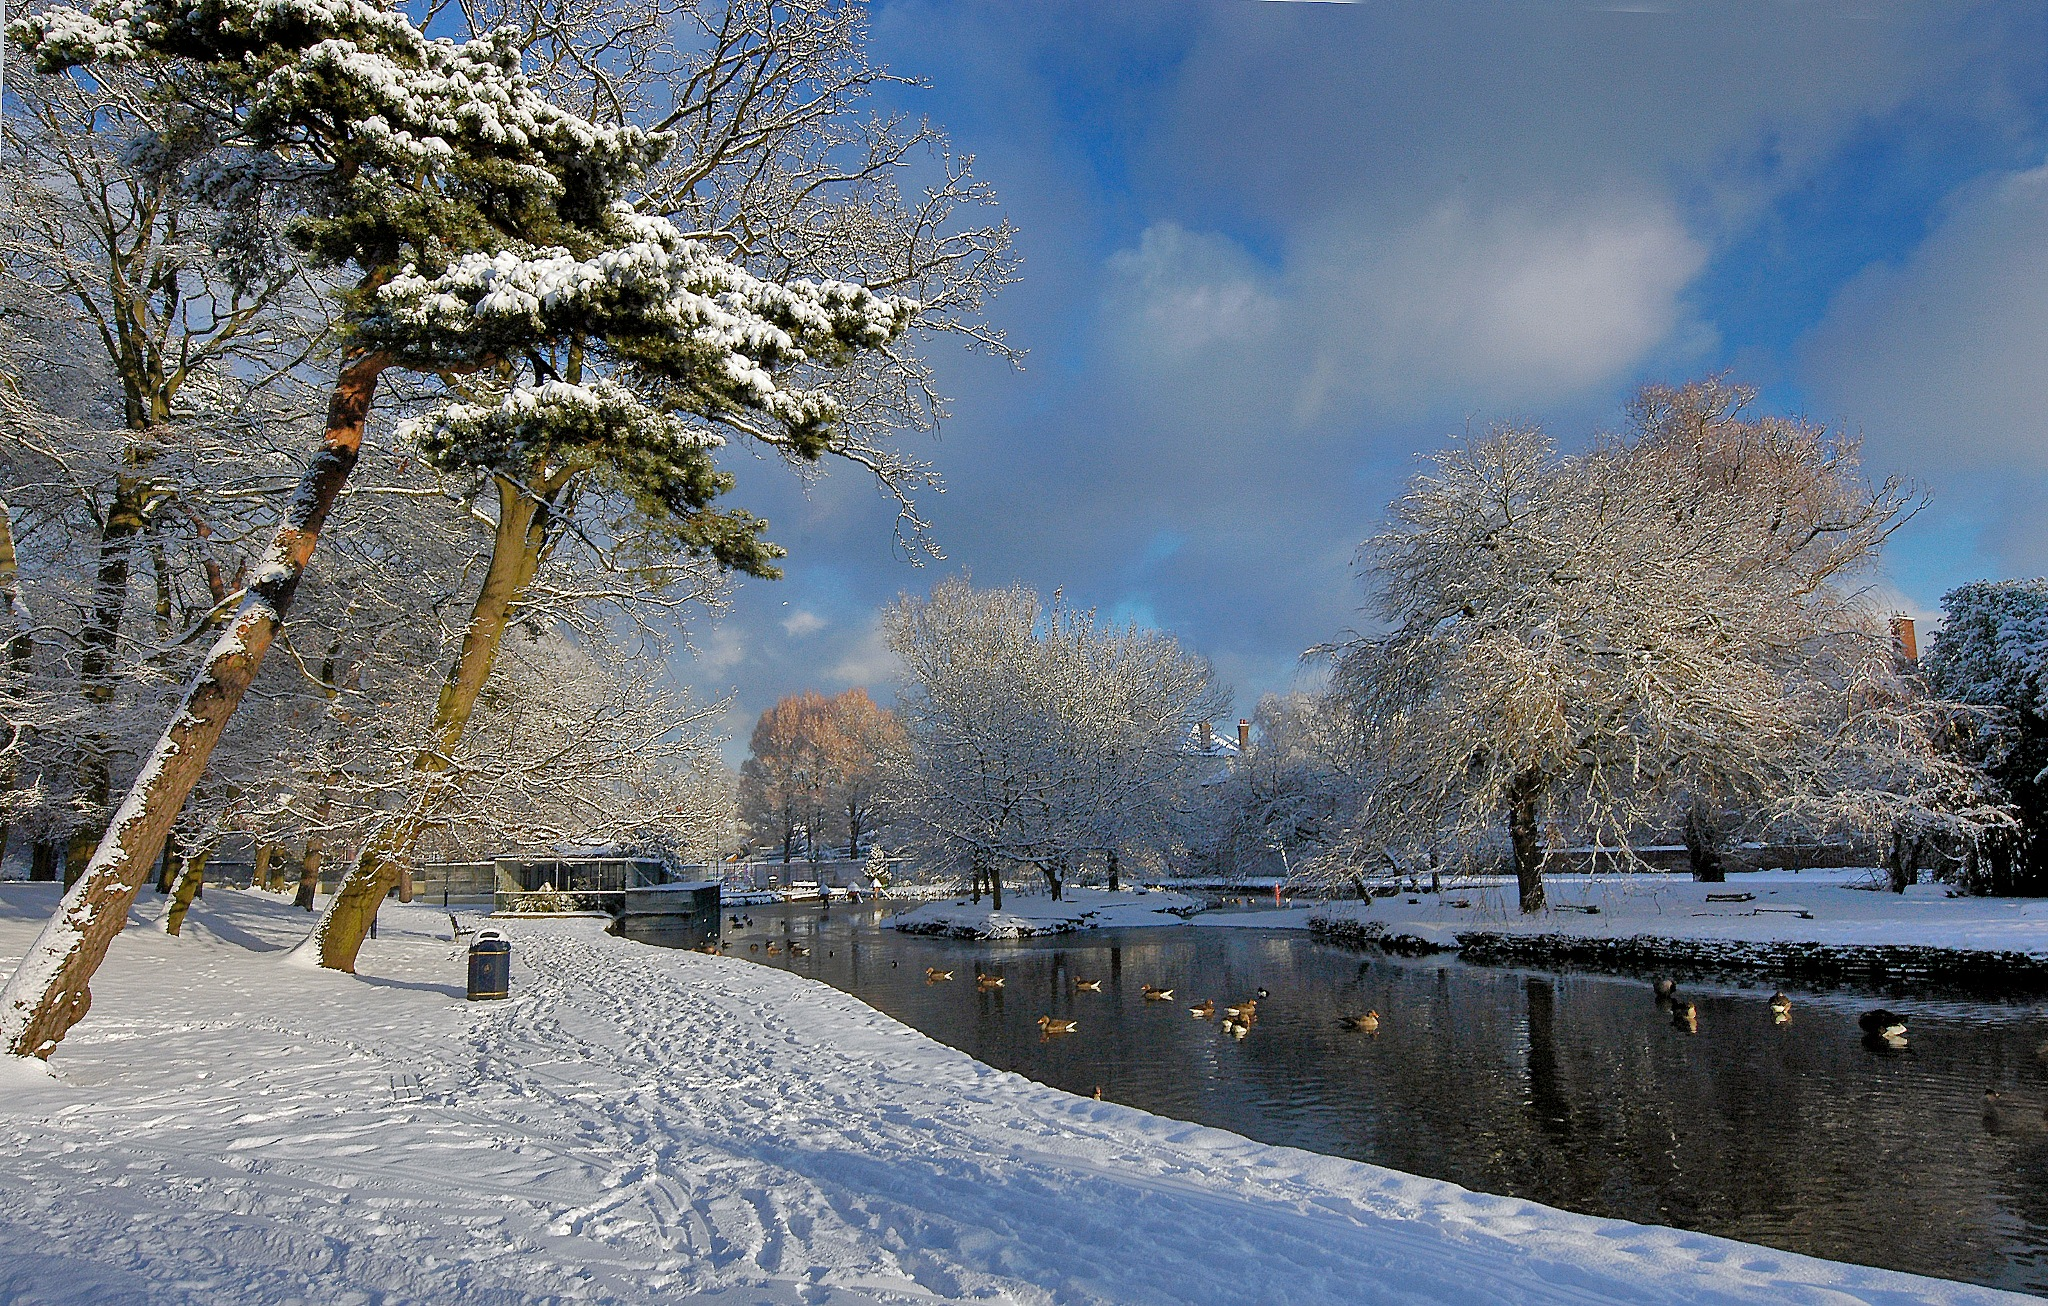 Winter Wonder by PeterMChambers